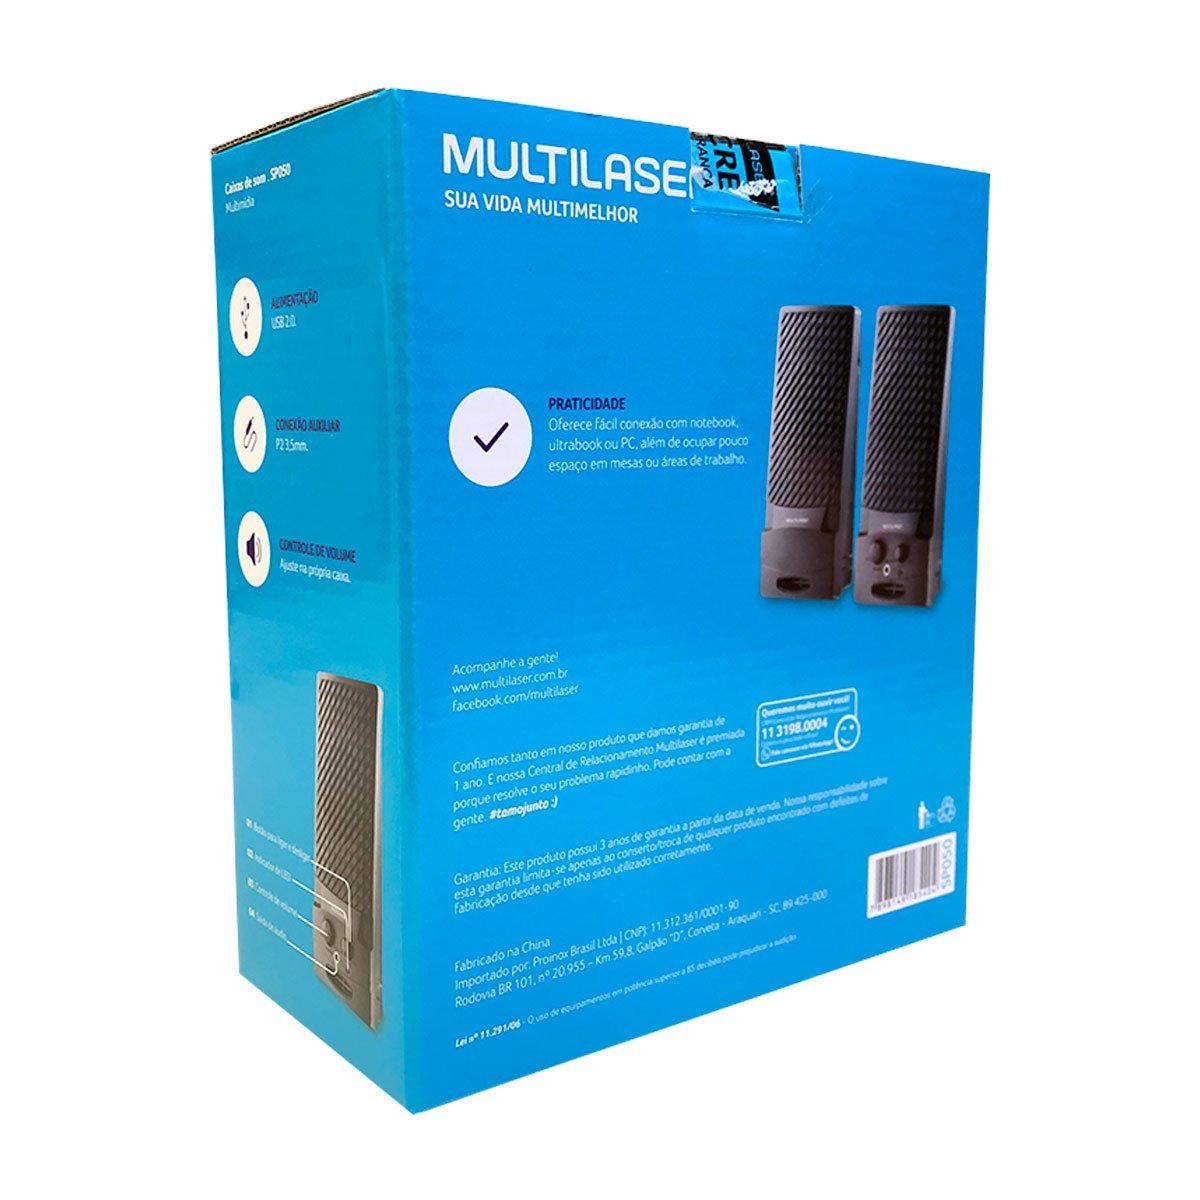 CAIXA DE SOM 2.0 1W RMS PRETA USB SP050 MULTILASER@